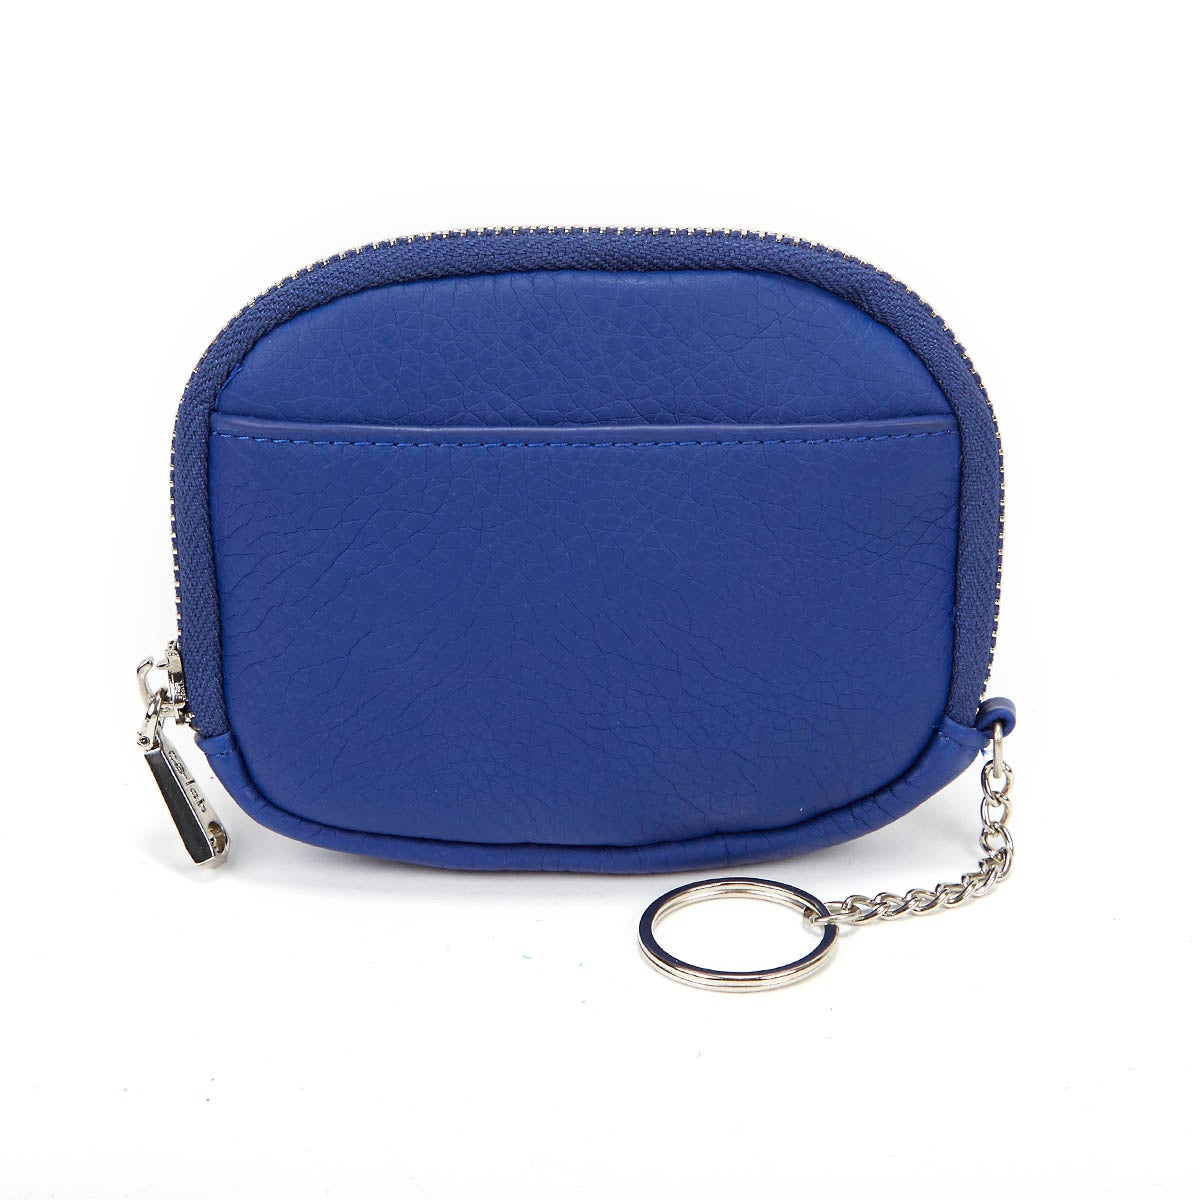 Porte-monnaie 4888, bleu cobalt, femmes